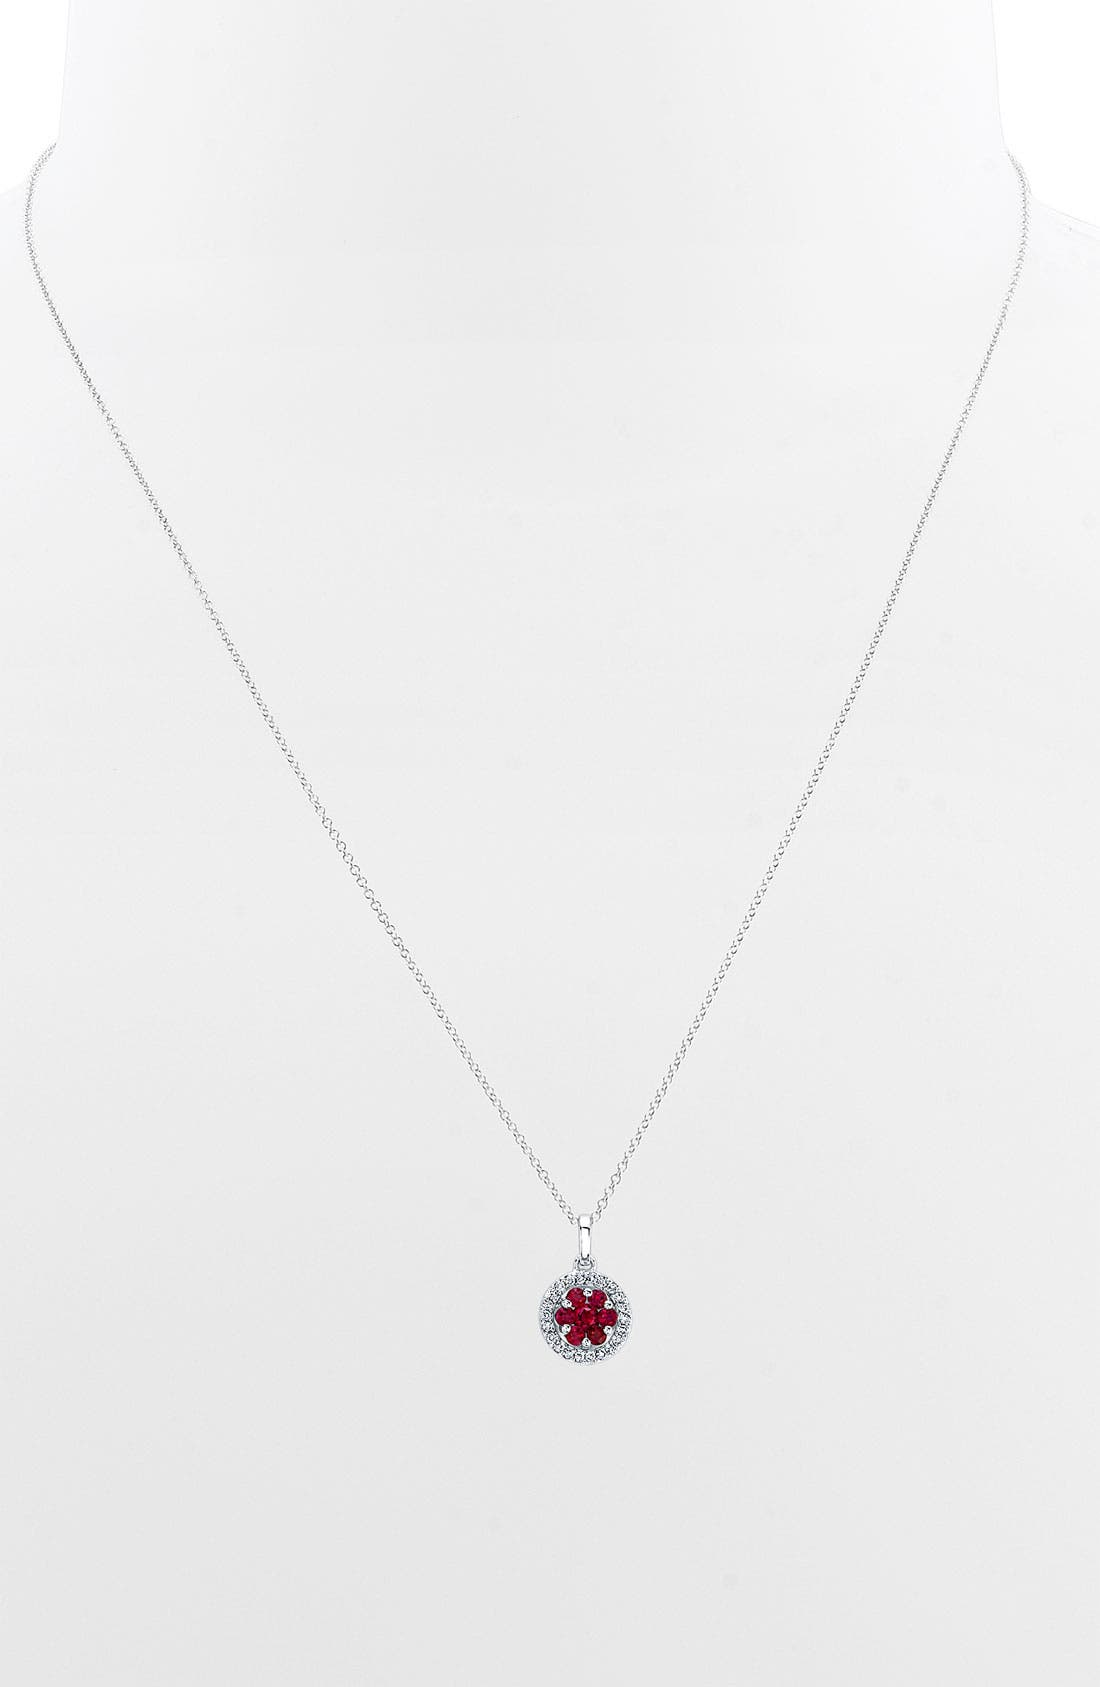 Main Image - Bony Levy Flower Button Diamond & Gemstone Pendant Necklace (Nordstrom Exclusive)